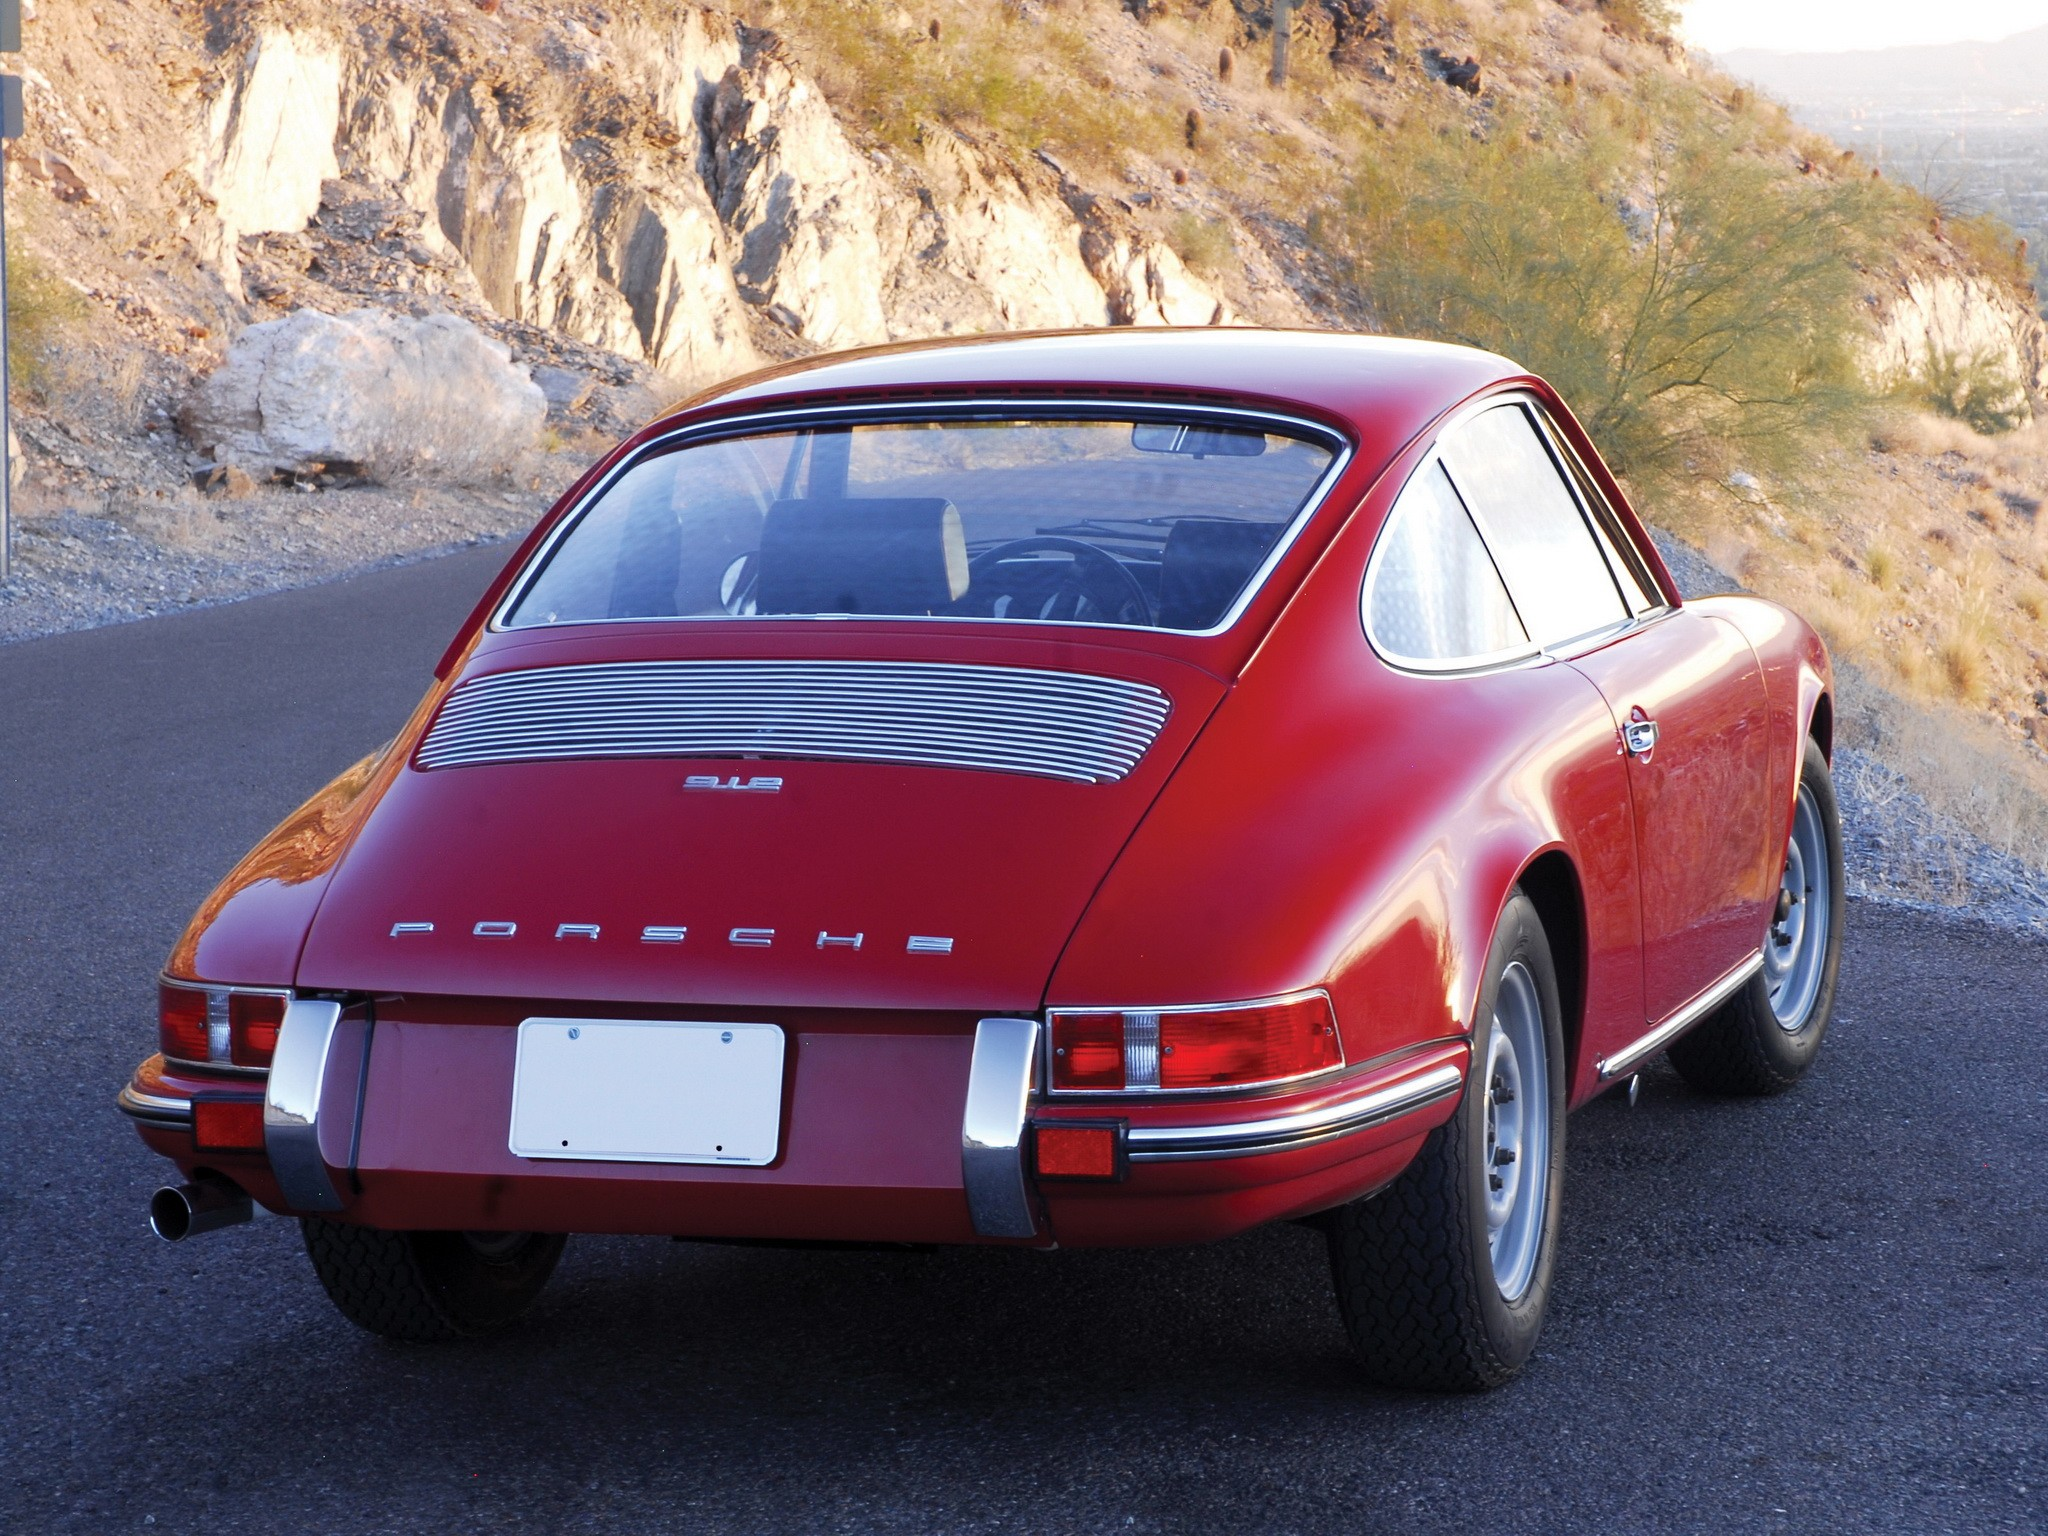 Porsche 912 901 Specs Photos 1965 1966 1967 1968 1969 Engine Diagram